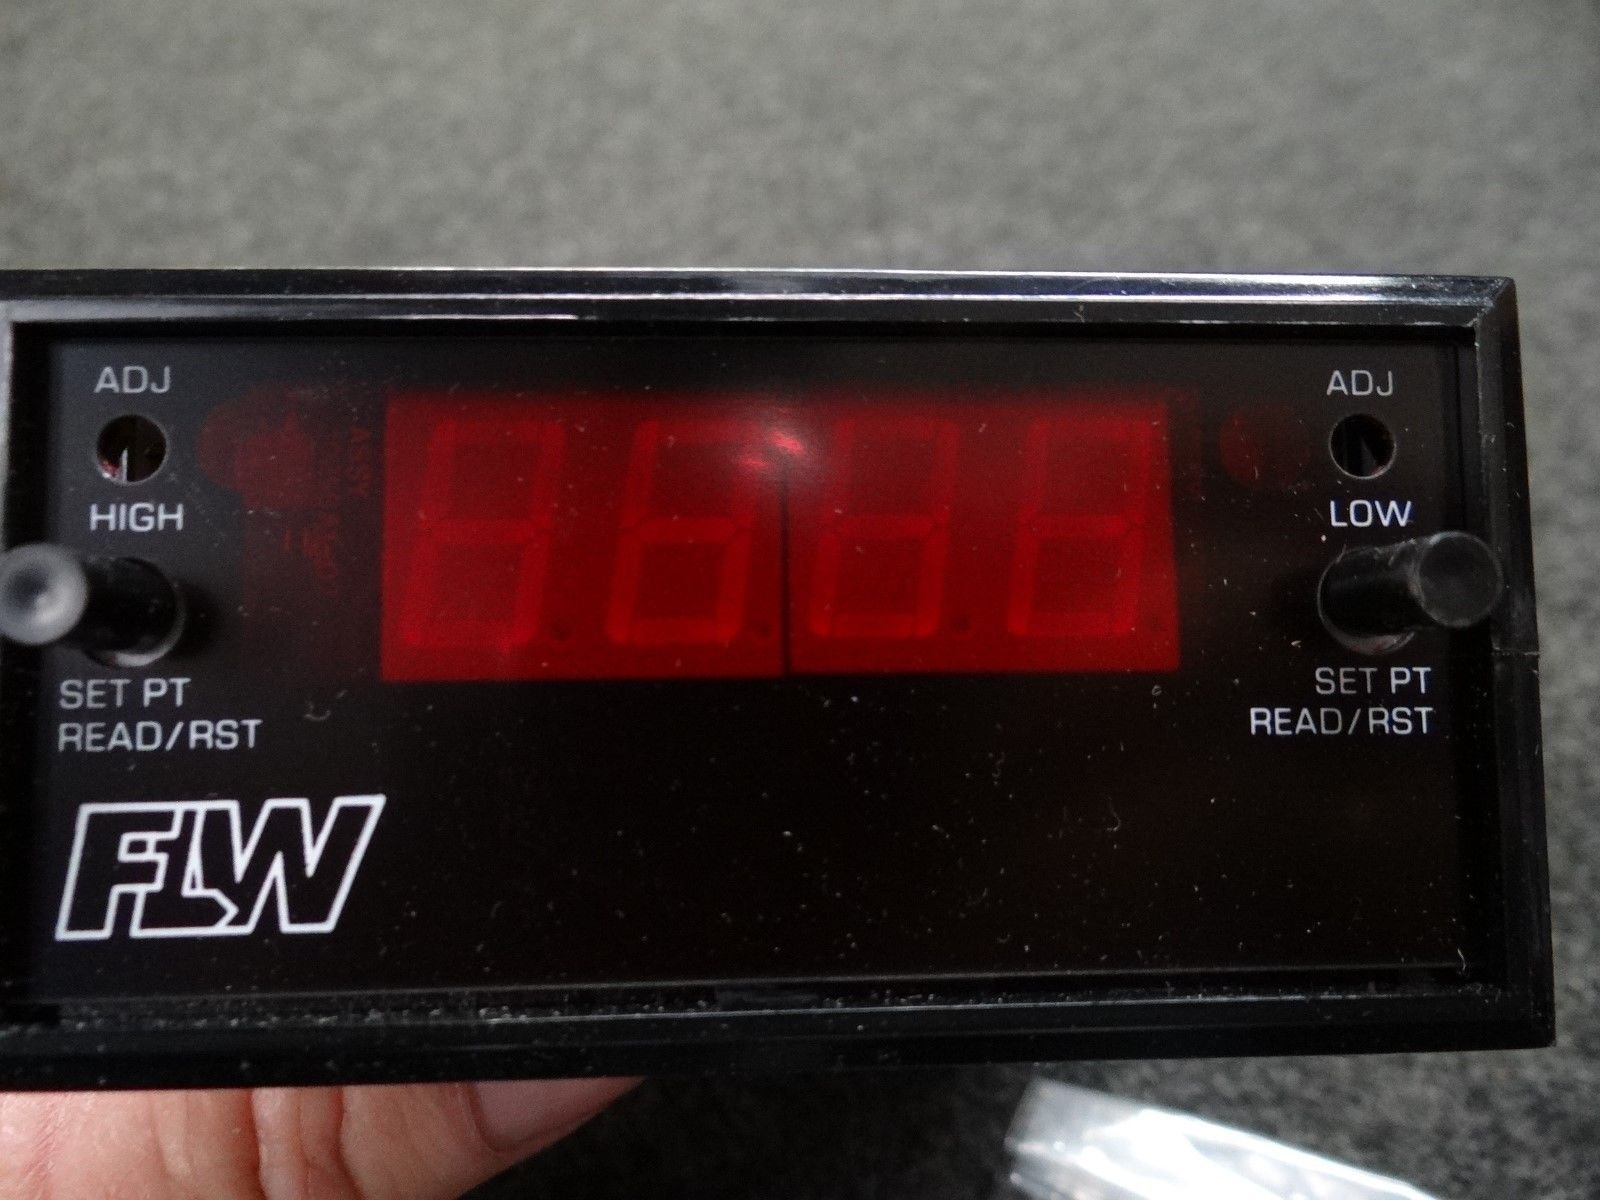 New Newport FLW Digital Panel Meter Q2002 JDF1, 120V, 3W